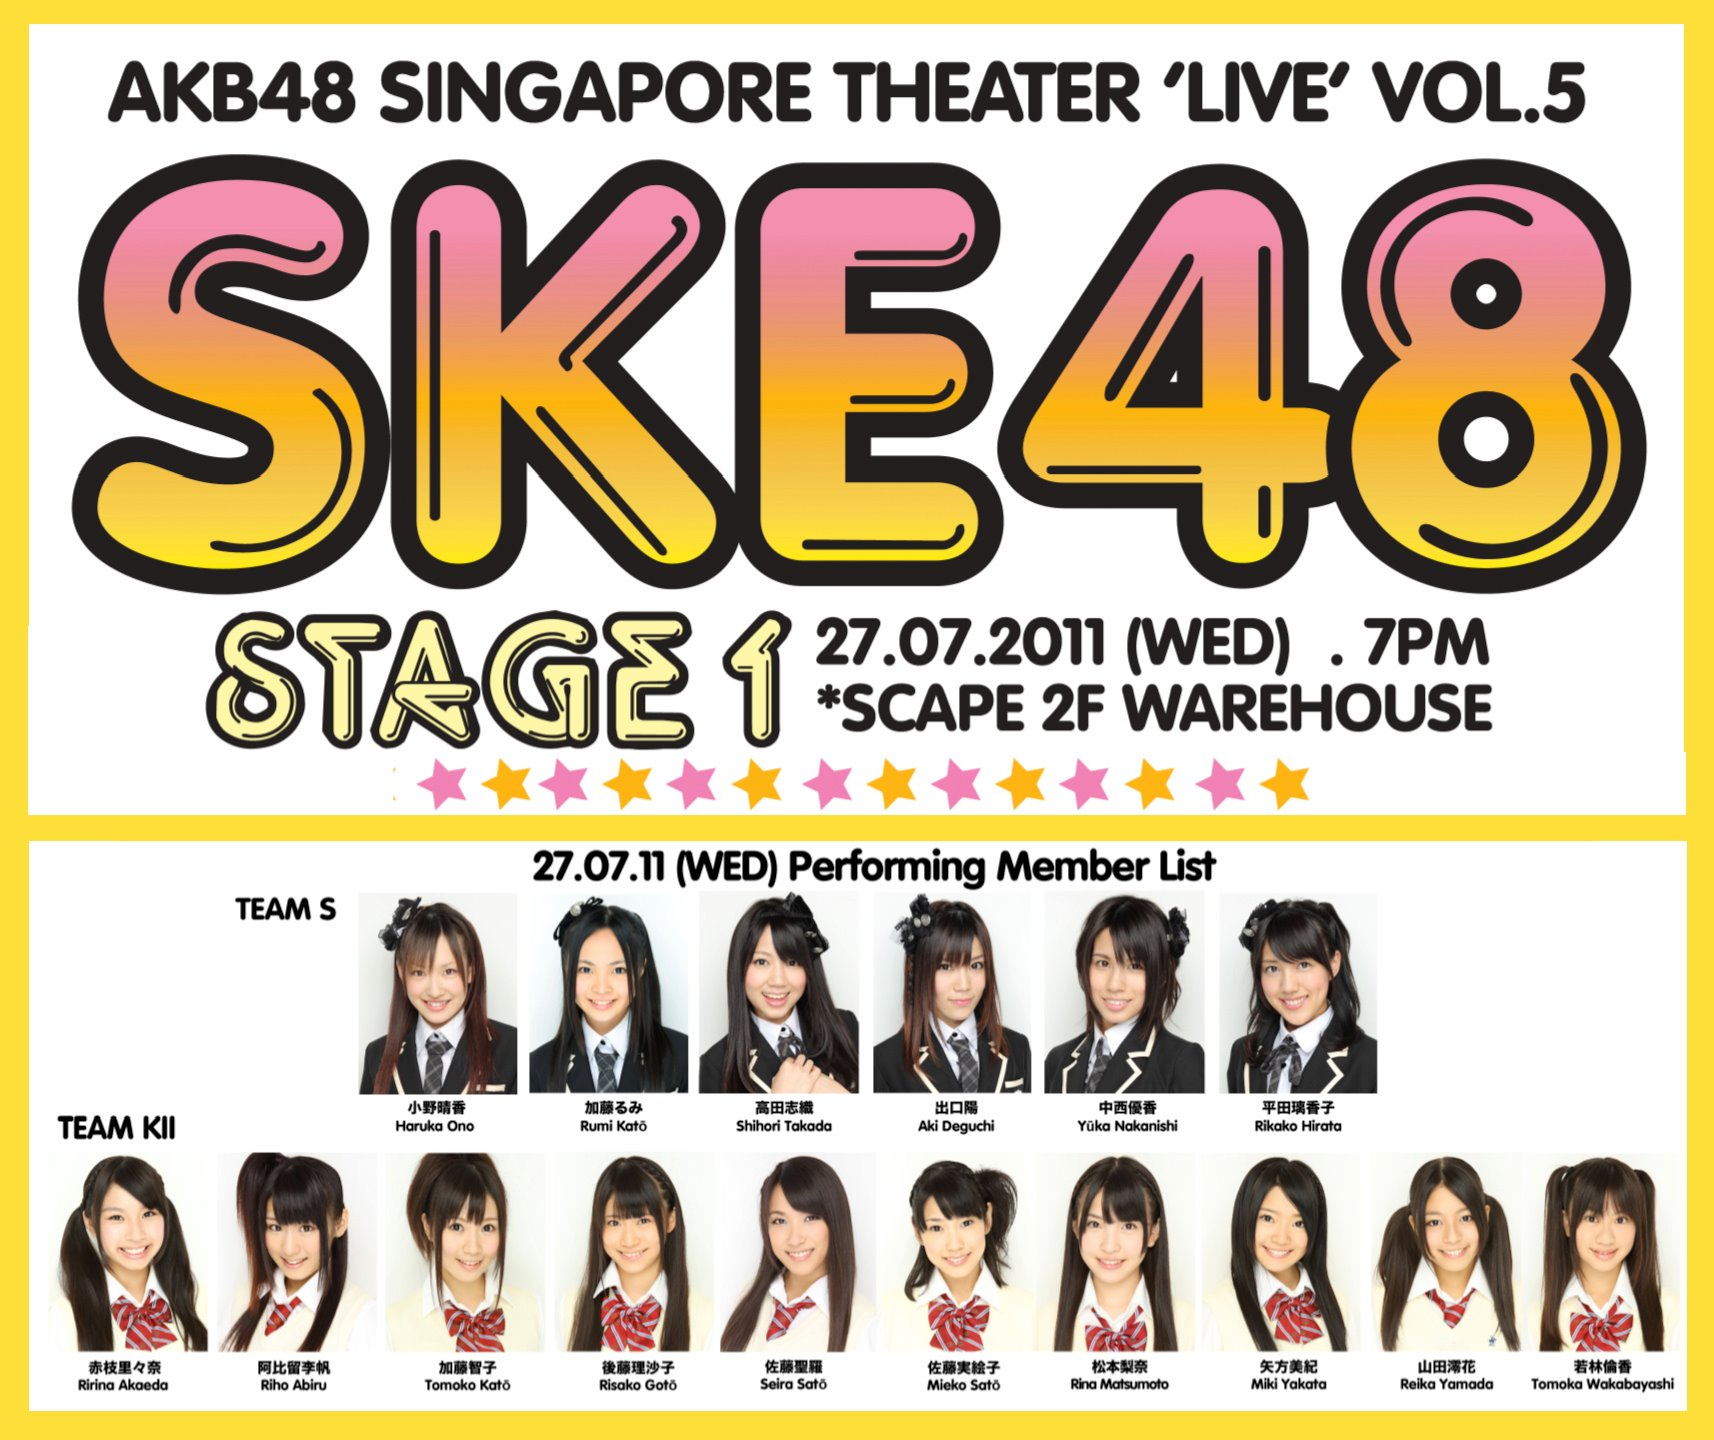 SKE48 SG Theater Performance